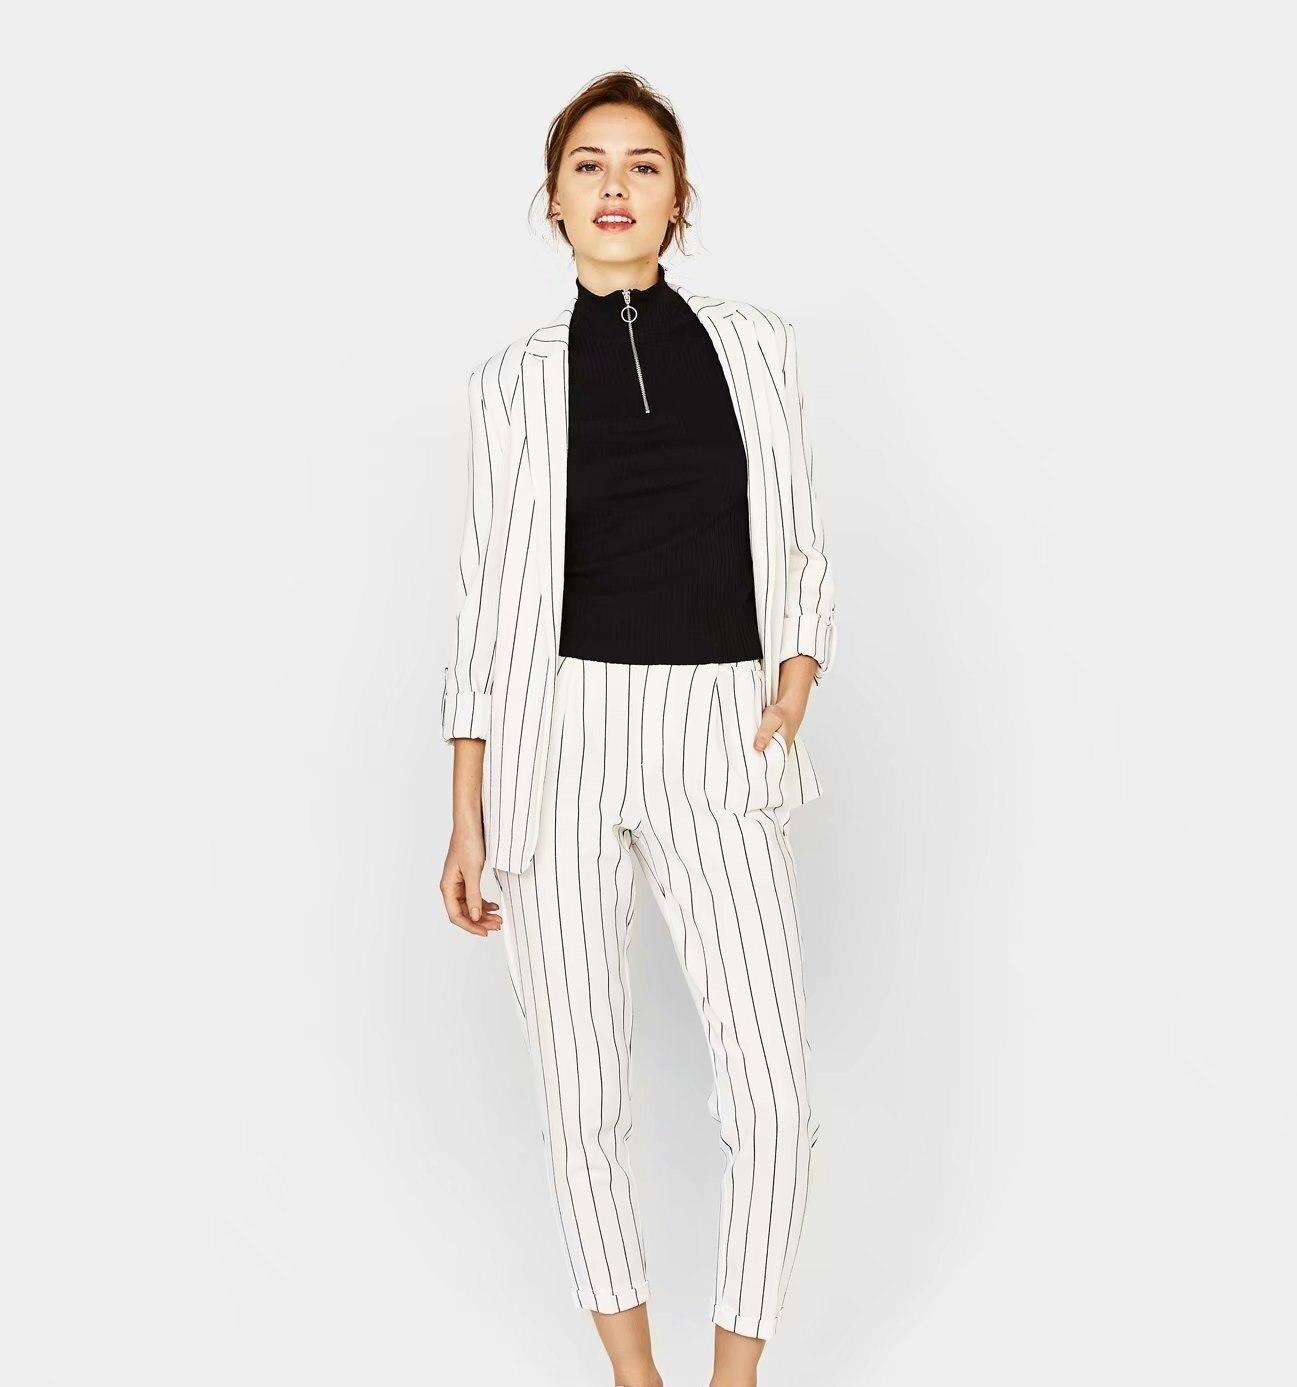 Fashion Work P Ant Suits 2 Piece Set Women Striped Blazer Jacket Trouser Office Lady Suit Feminino